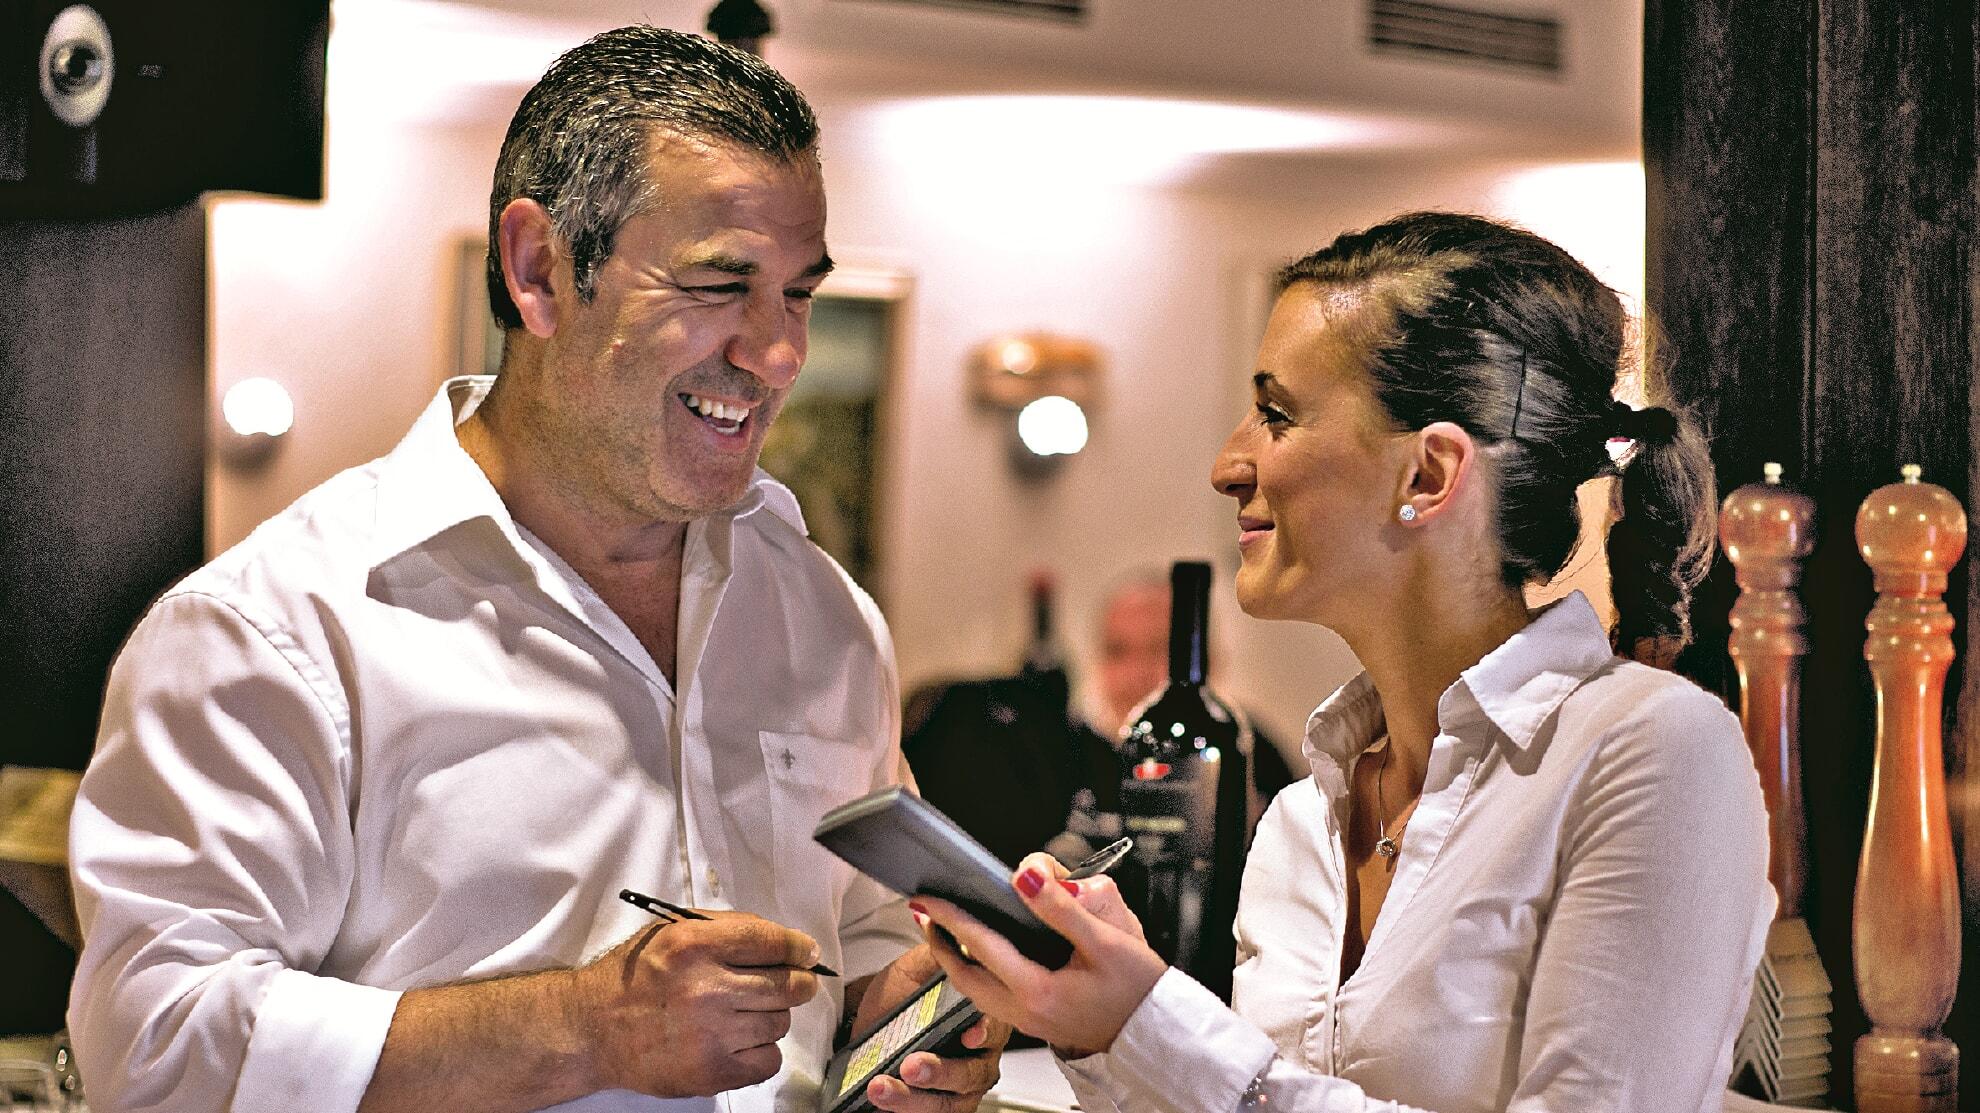 Gastgeber Restaurant La Pergola